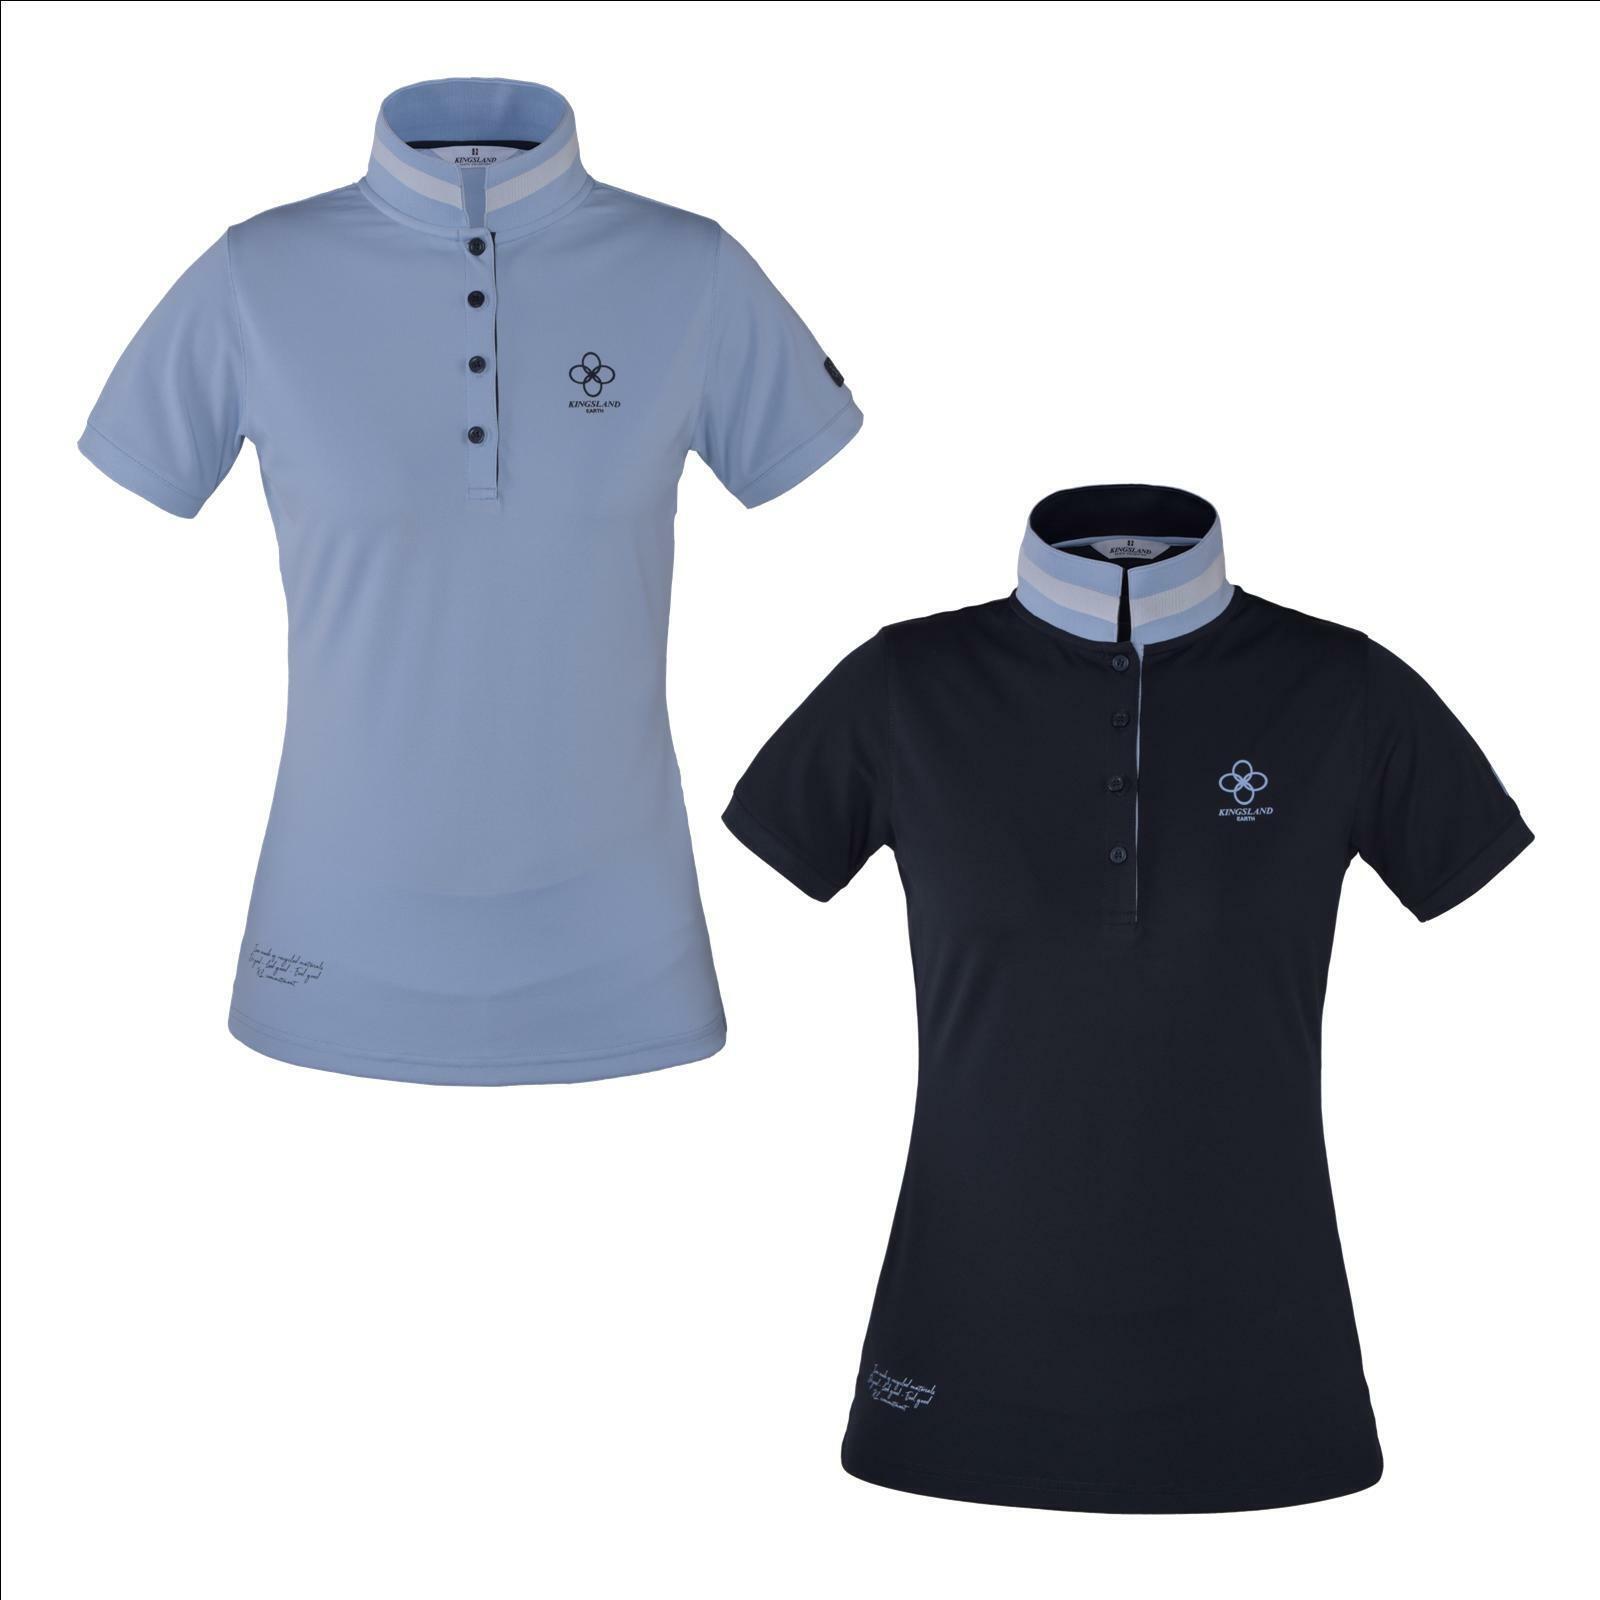 Kingsland EARTH - Kollektion Recyceltes Piqué-Poloshirt für Damen   KL_CHERRY